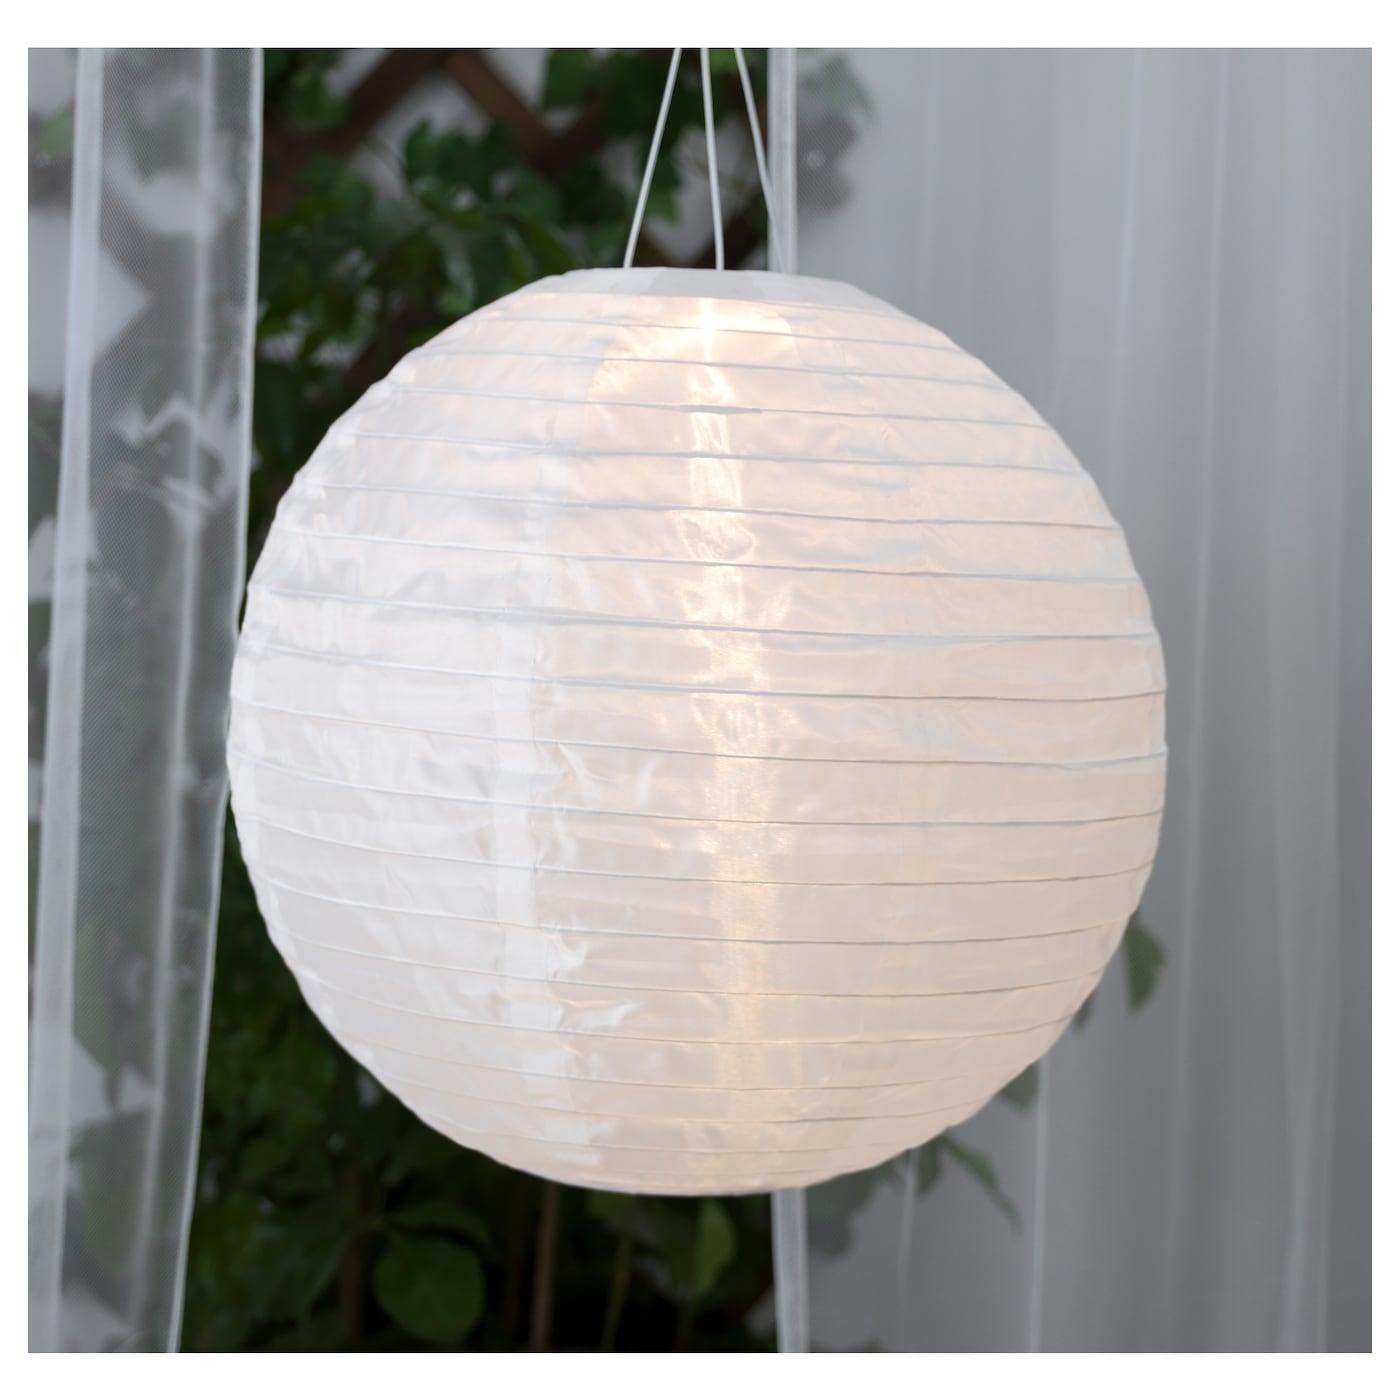 solvinden solar powered pendant lamp globe white 45 cm ikea. Black Bedroom Furniture Sets. Home Design Ideas